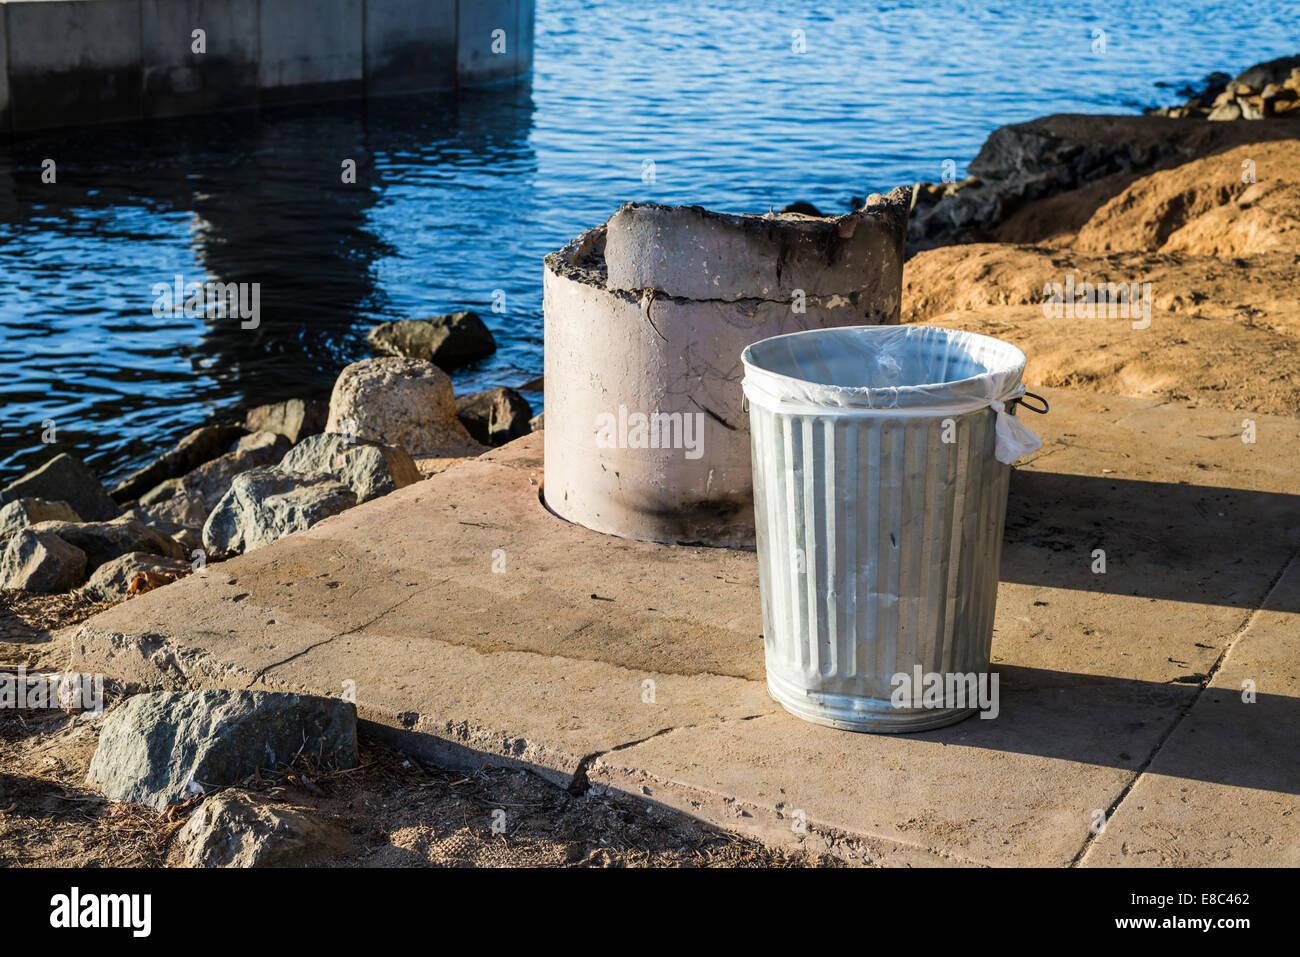 Metal trash can. - Stock Image